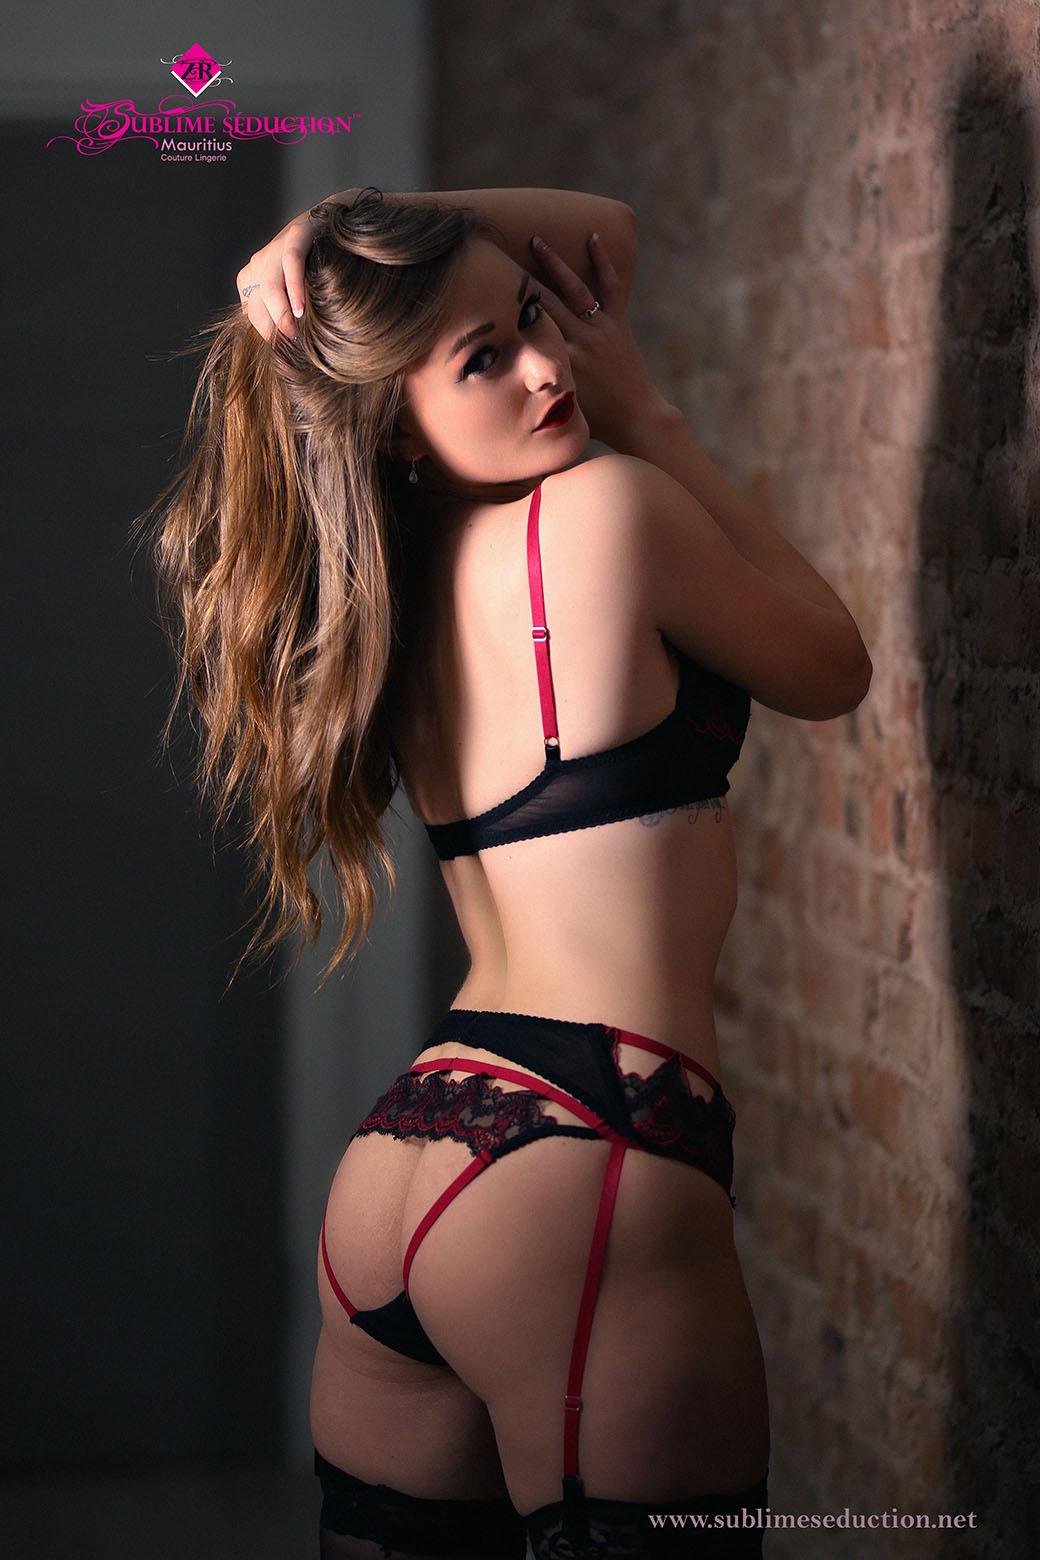 Seduction with lingerie